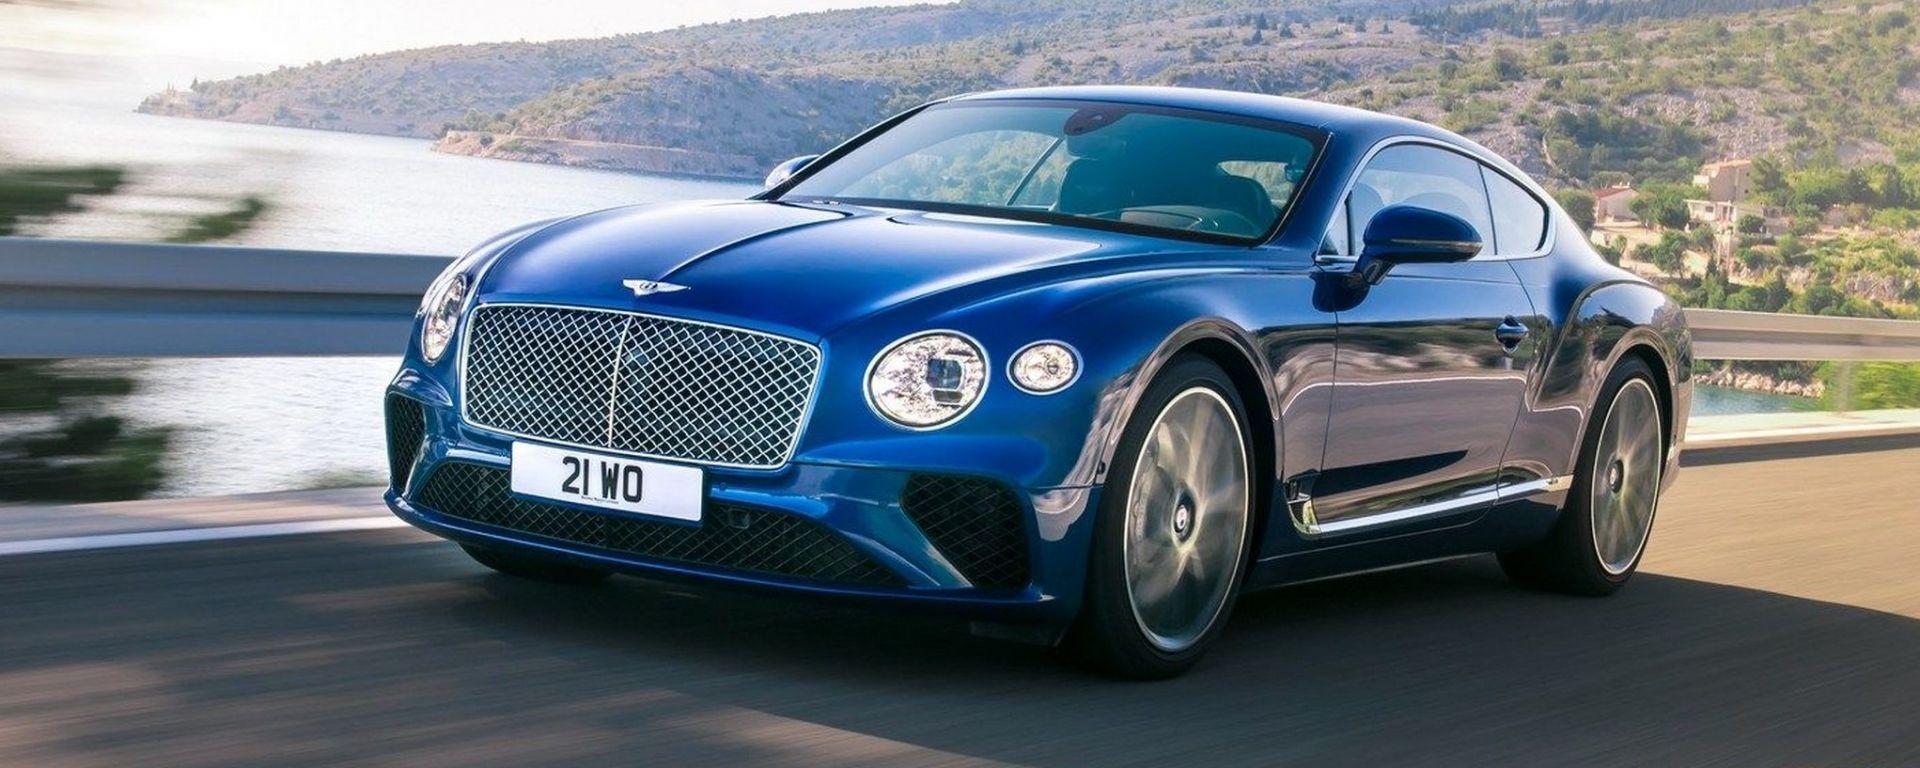 Bentley conferma: la prossima Continental GT sarà elettrica